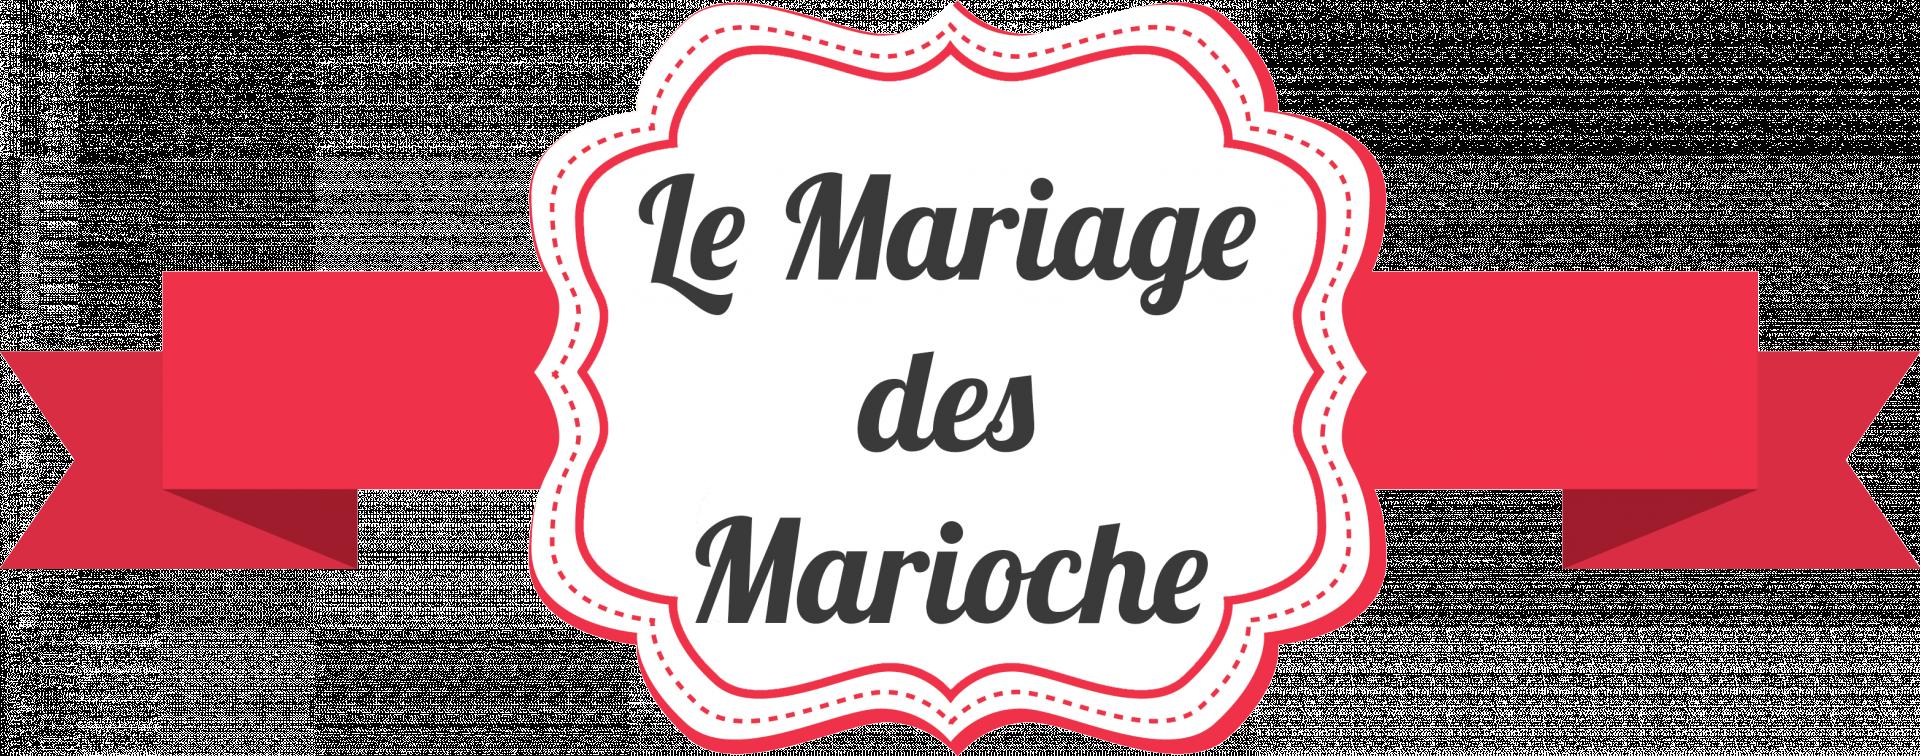 Logo Le Mariage des Marioche V03